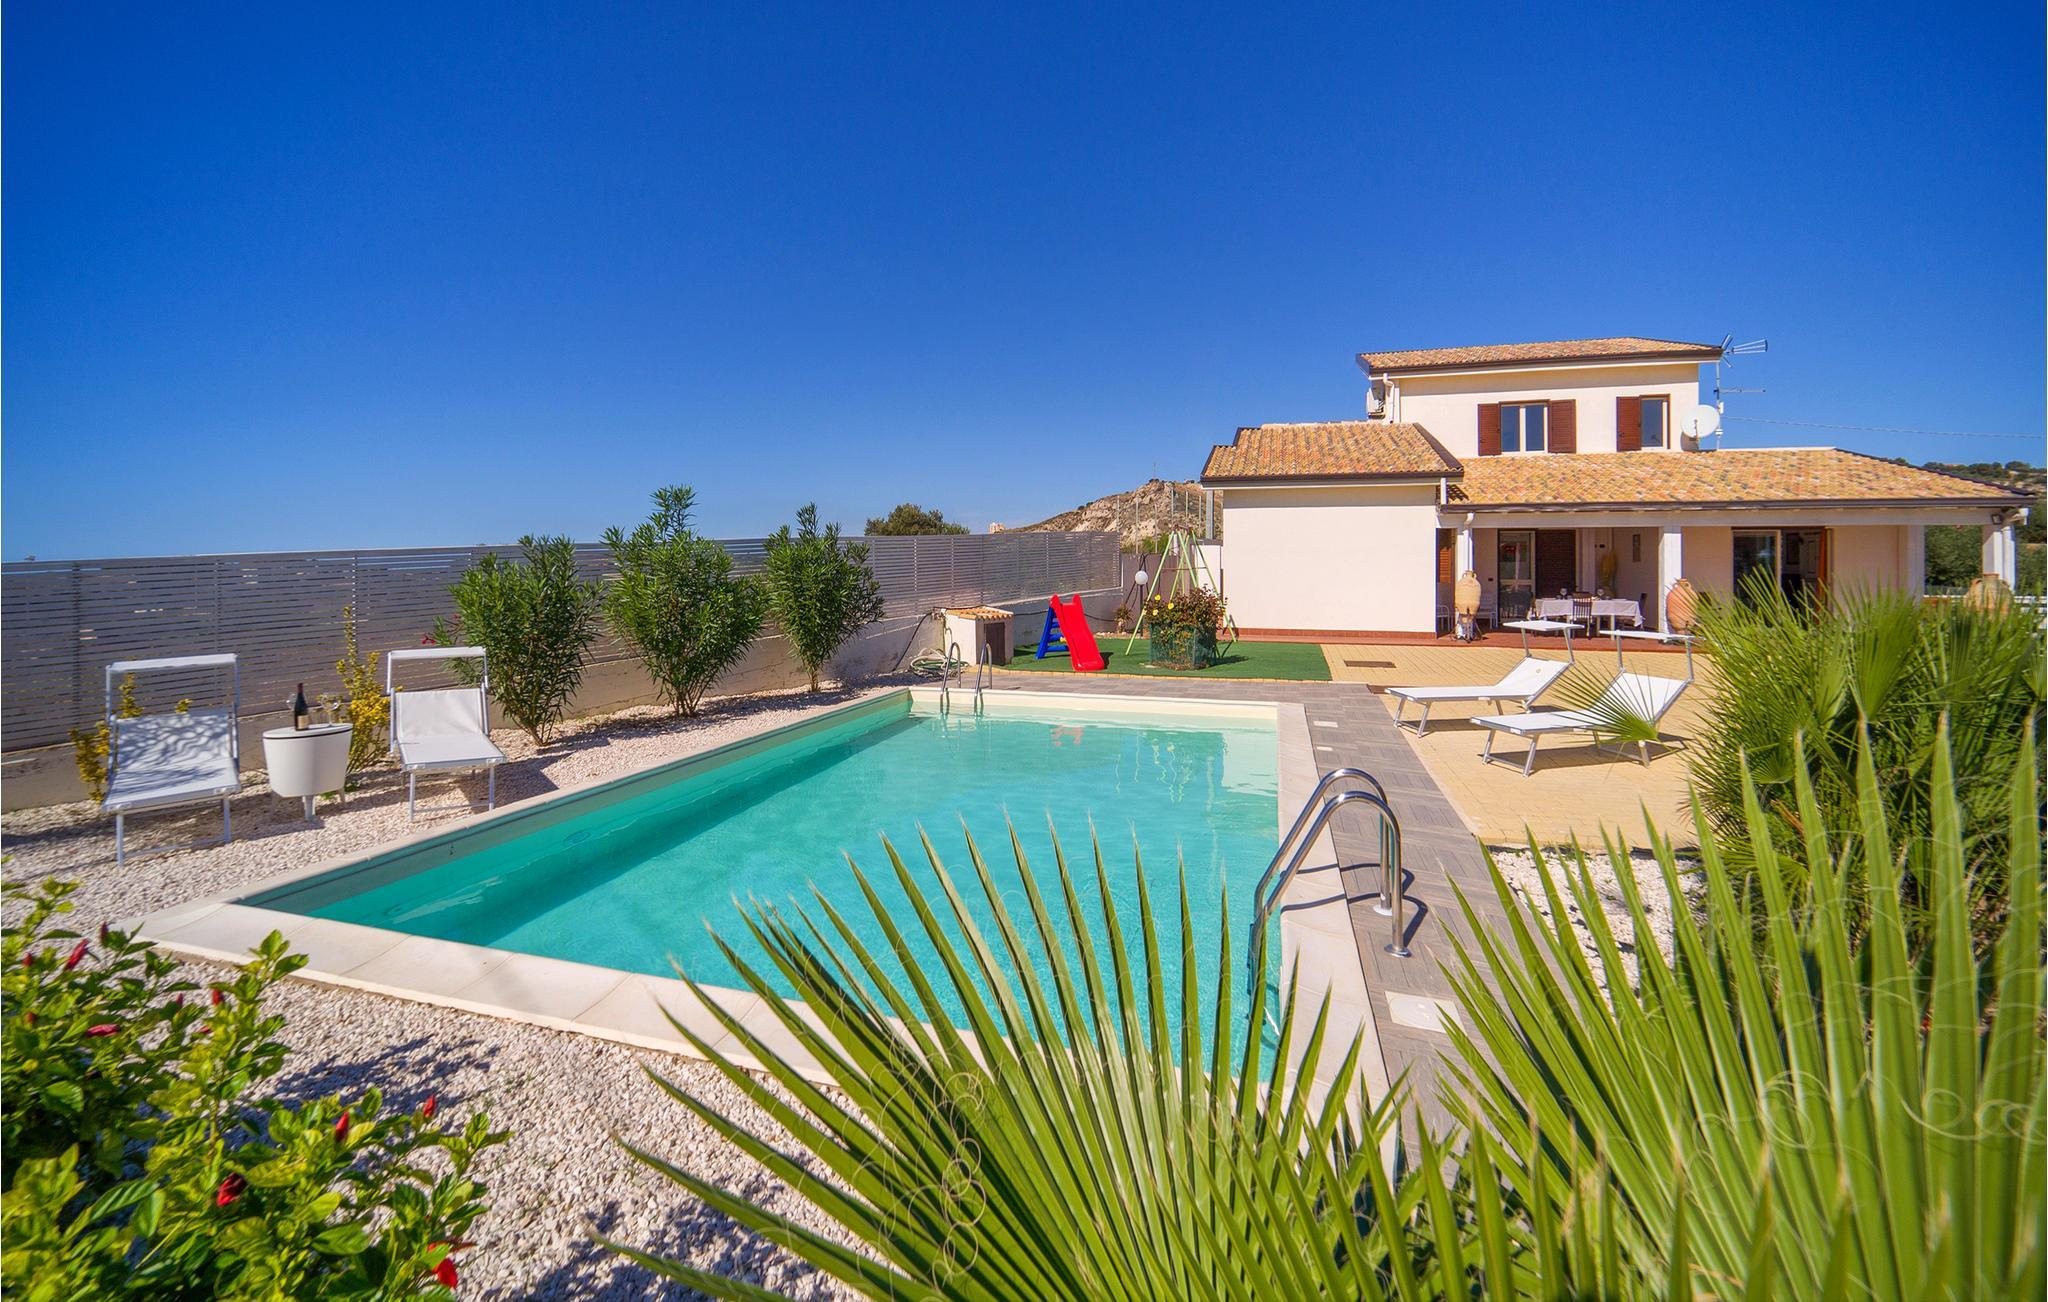 Holiday Home/Apartment   20 persons   Via Giovanni Falcone   20 ...